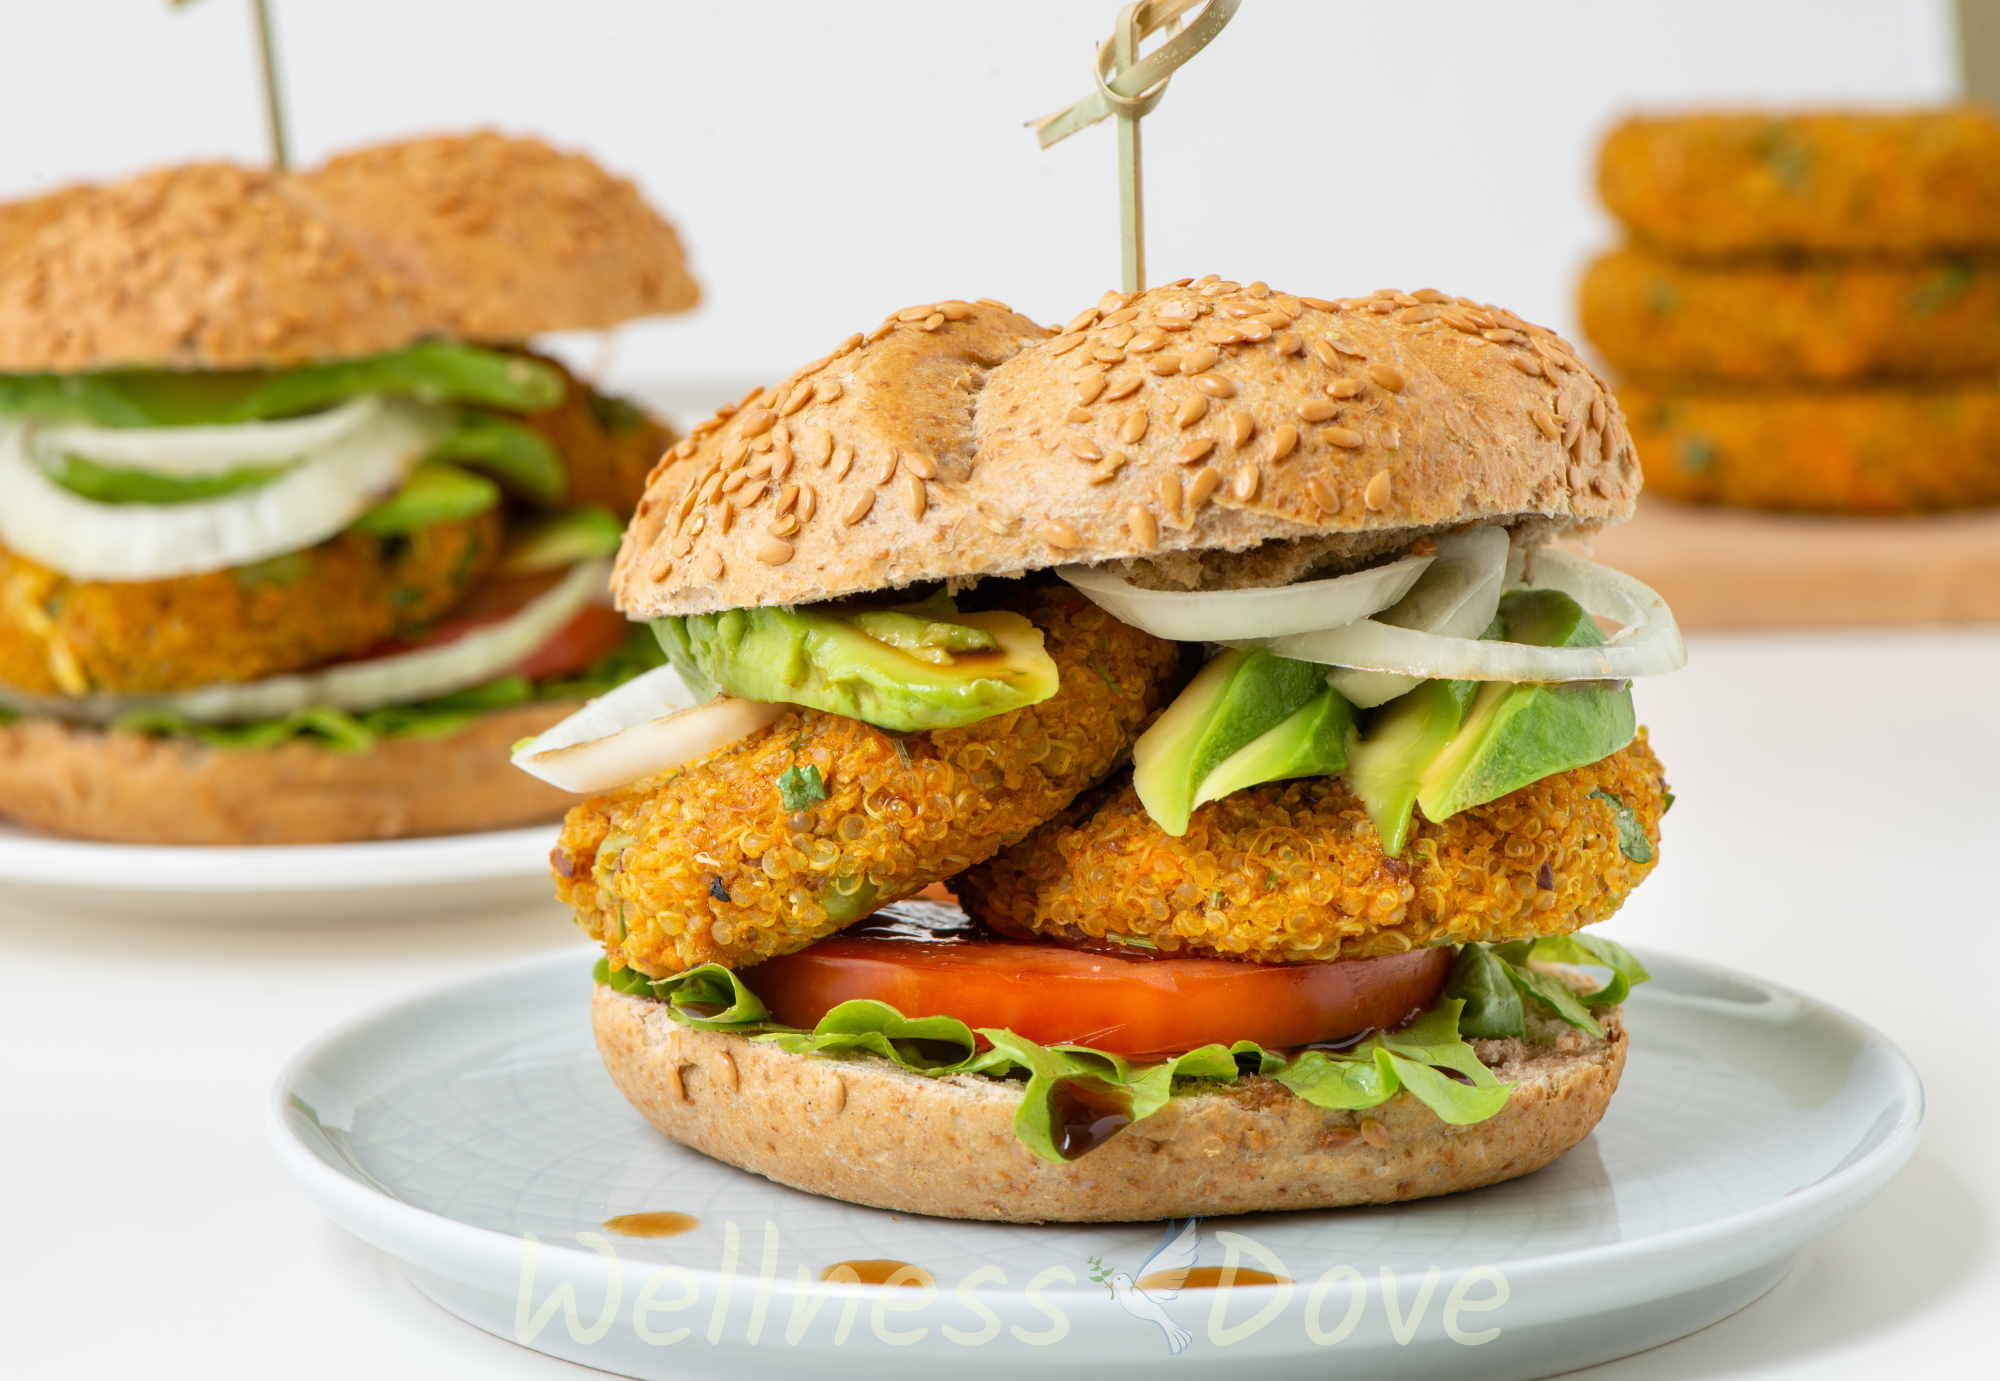 the vegan burger on a plate